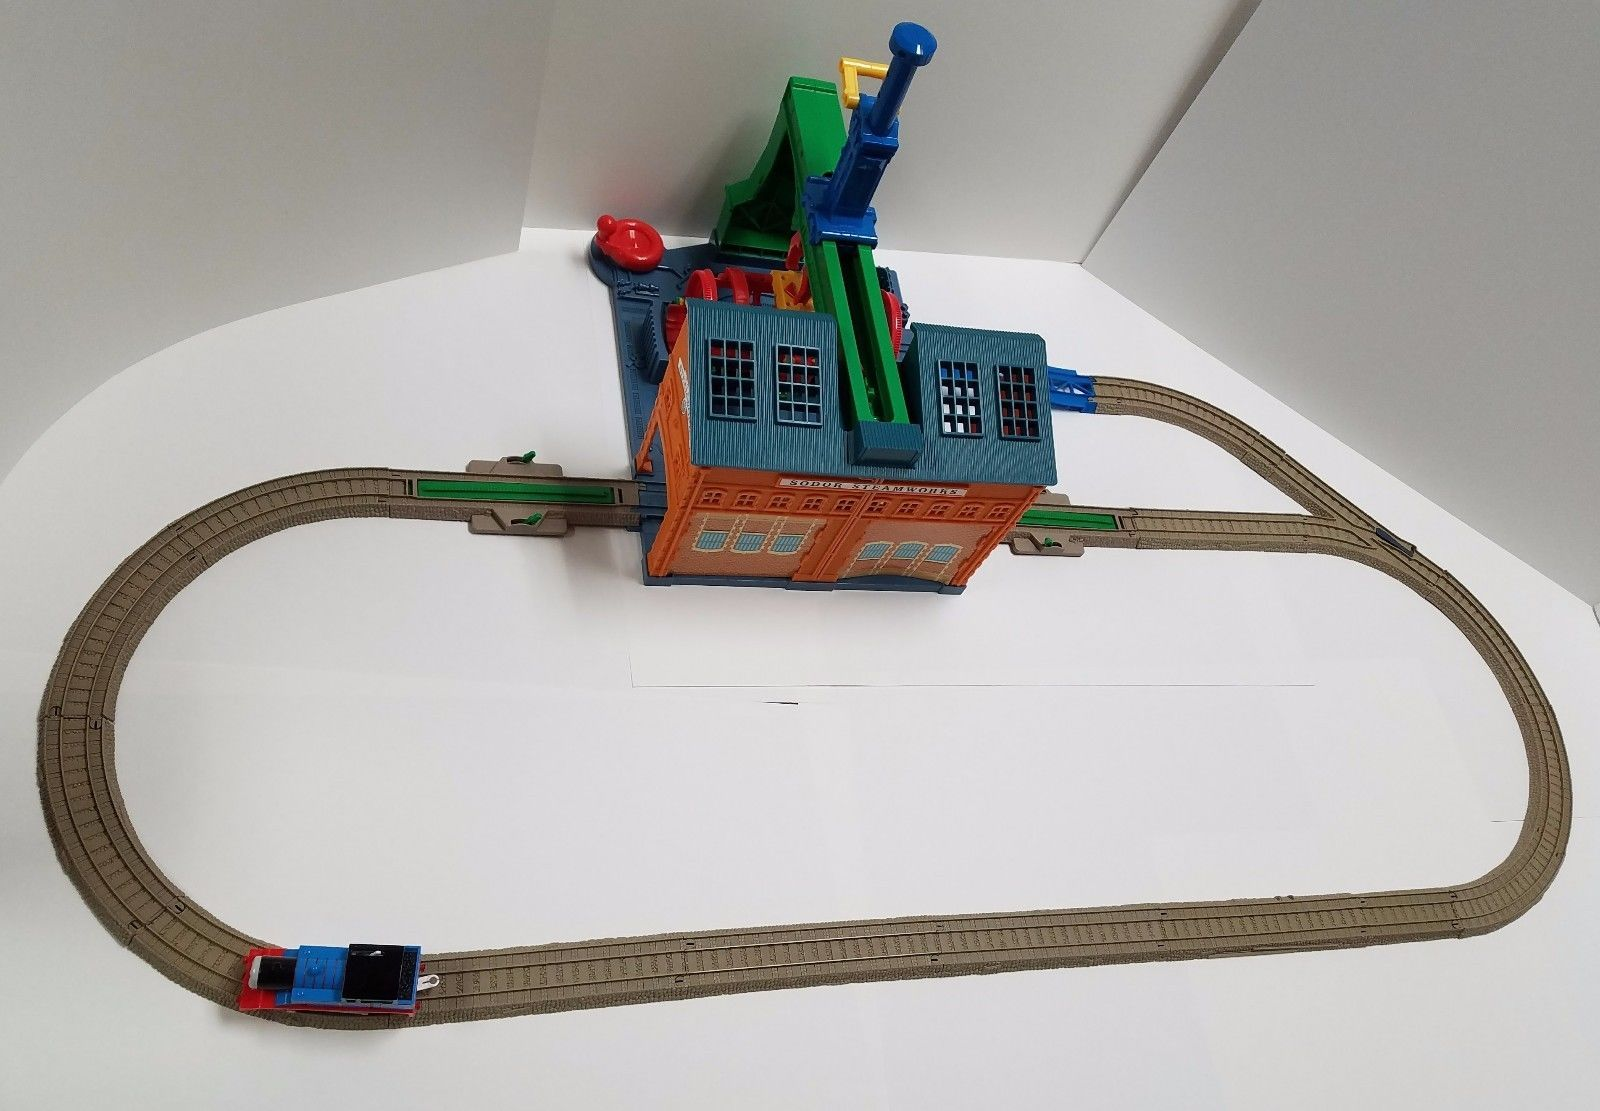 SODOR STEAMWORKS SPIN & FIX THOMAS & FRIENDS Train Set